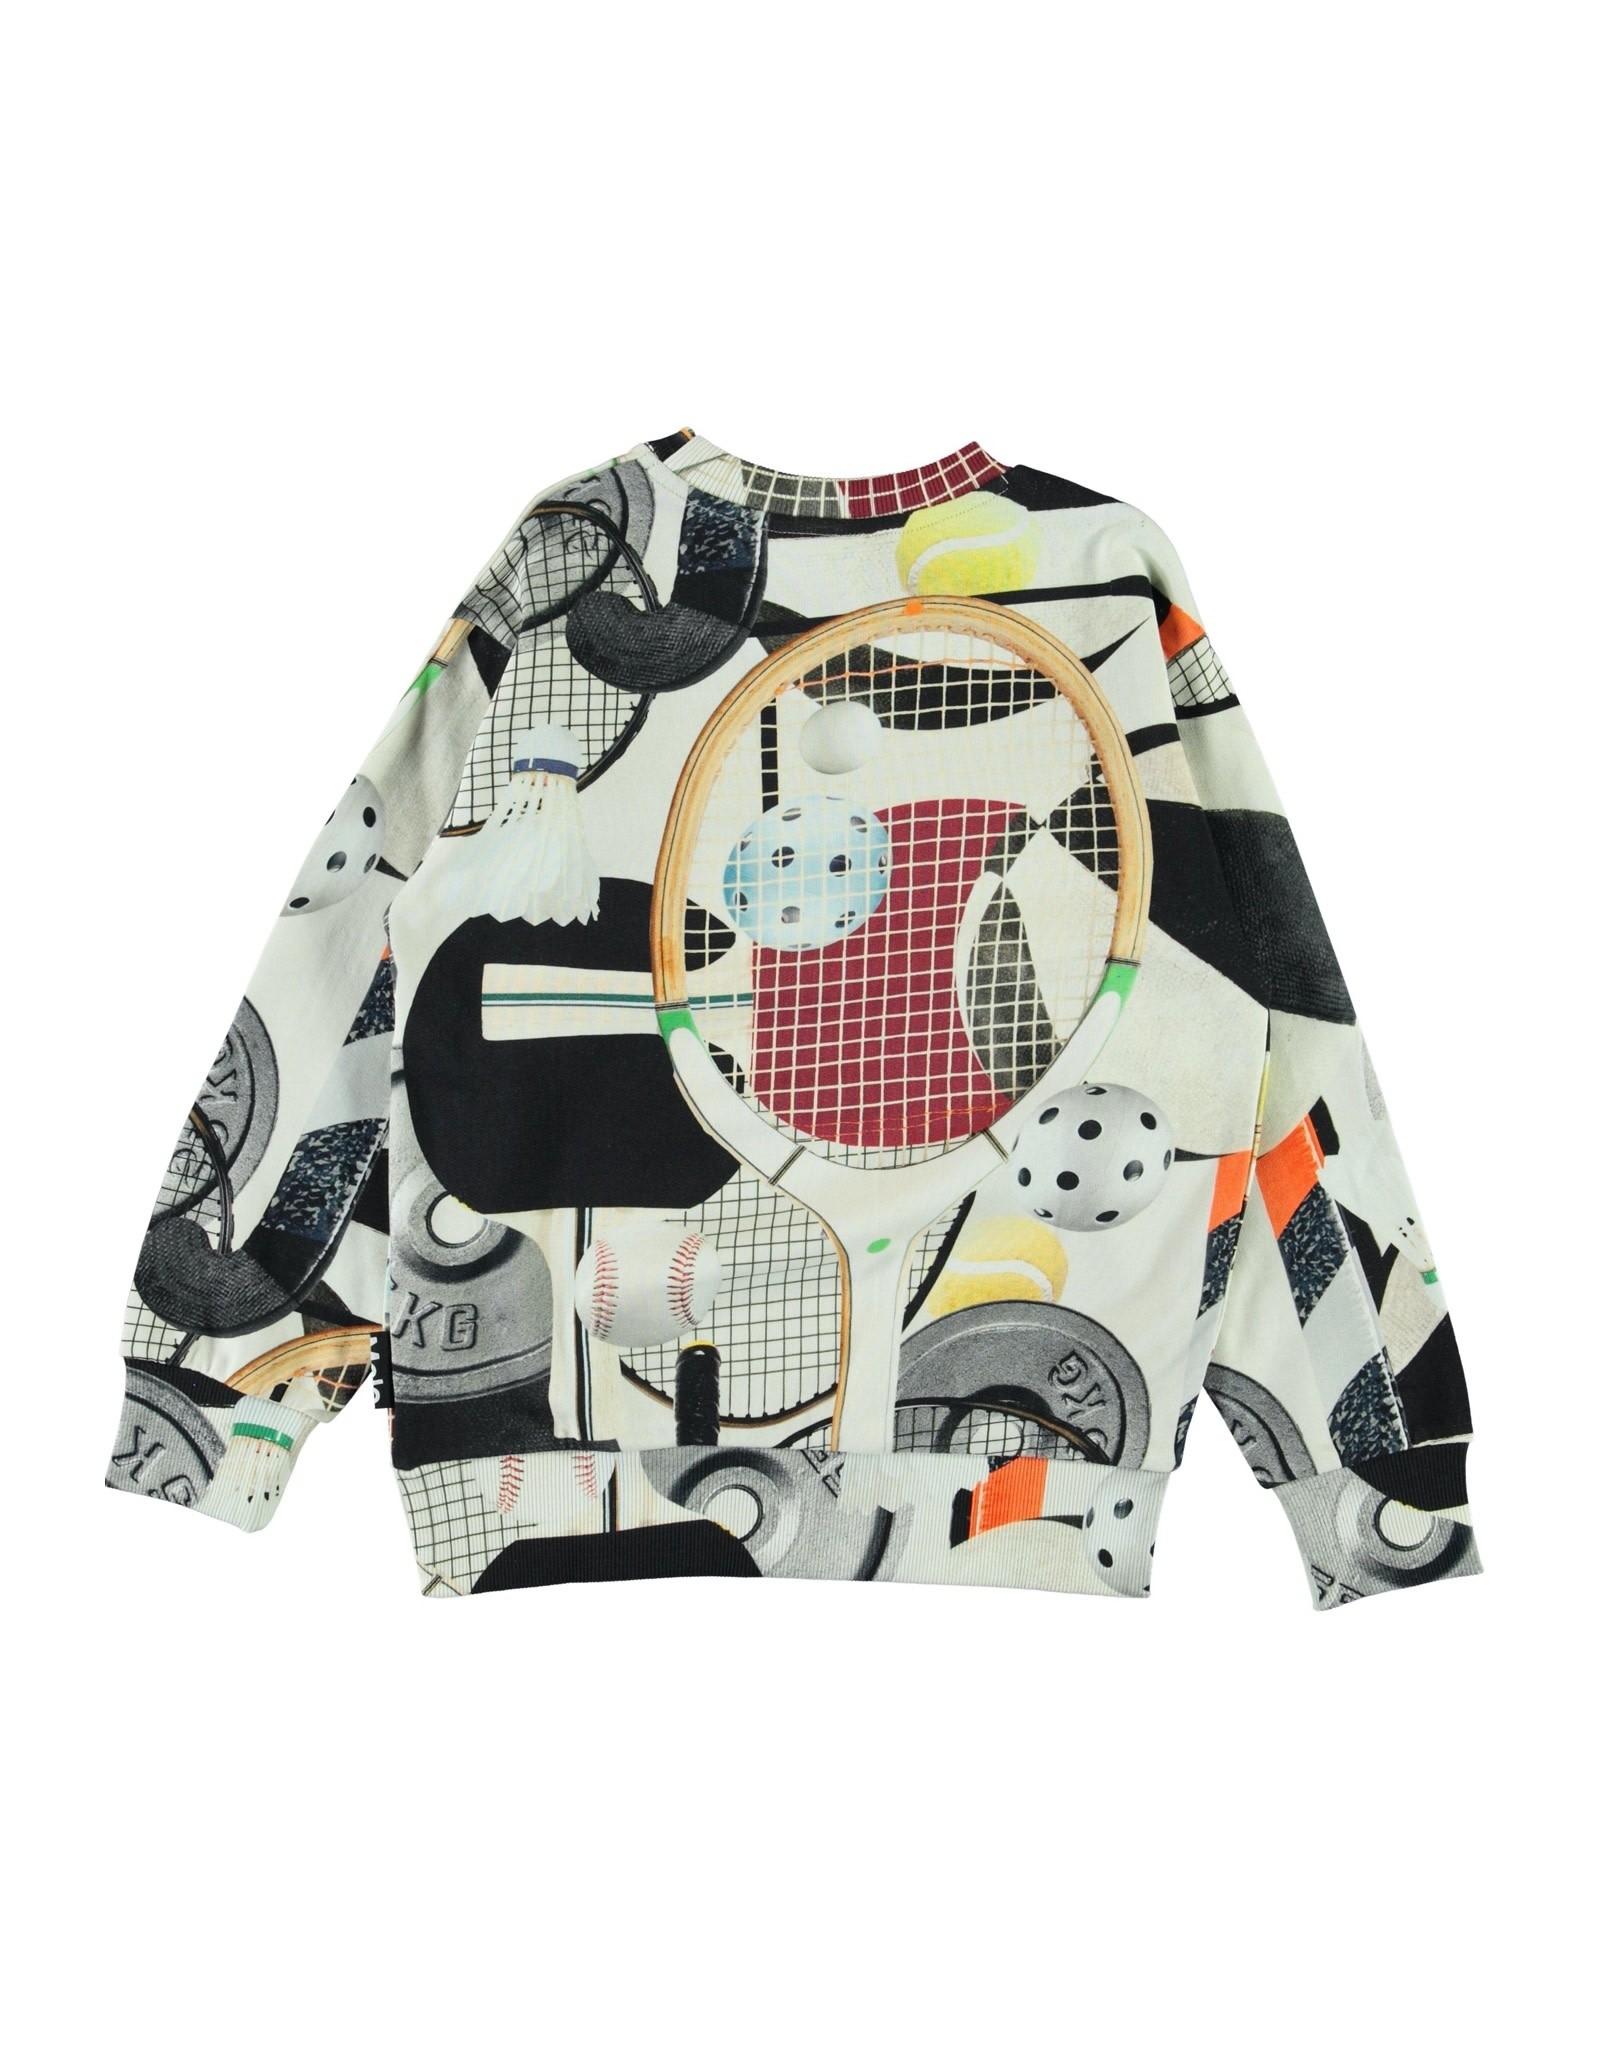 Molo Mik Sports Gear Sweat Shirt